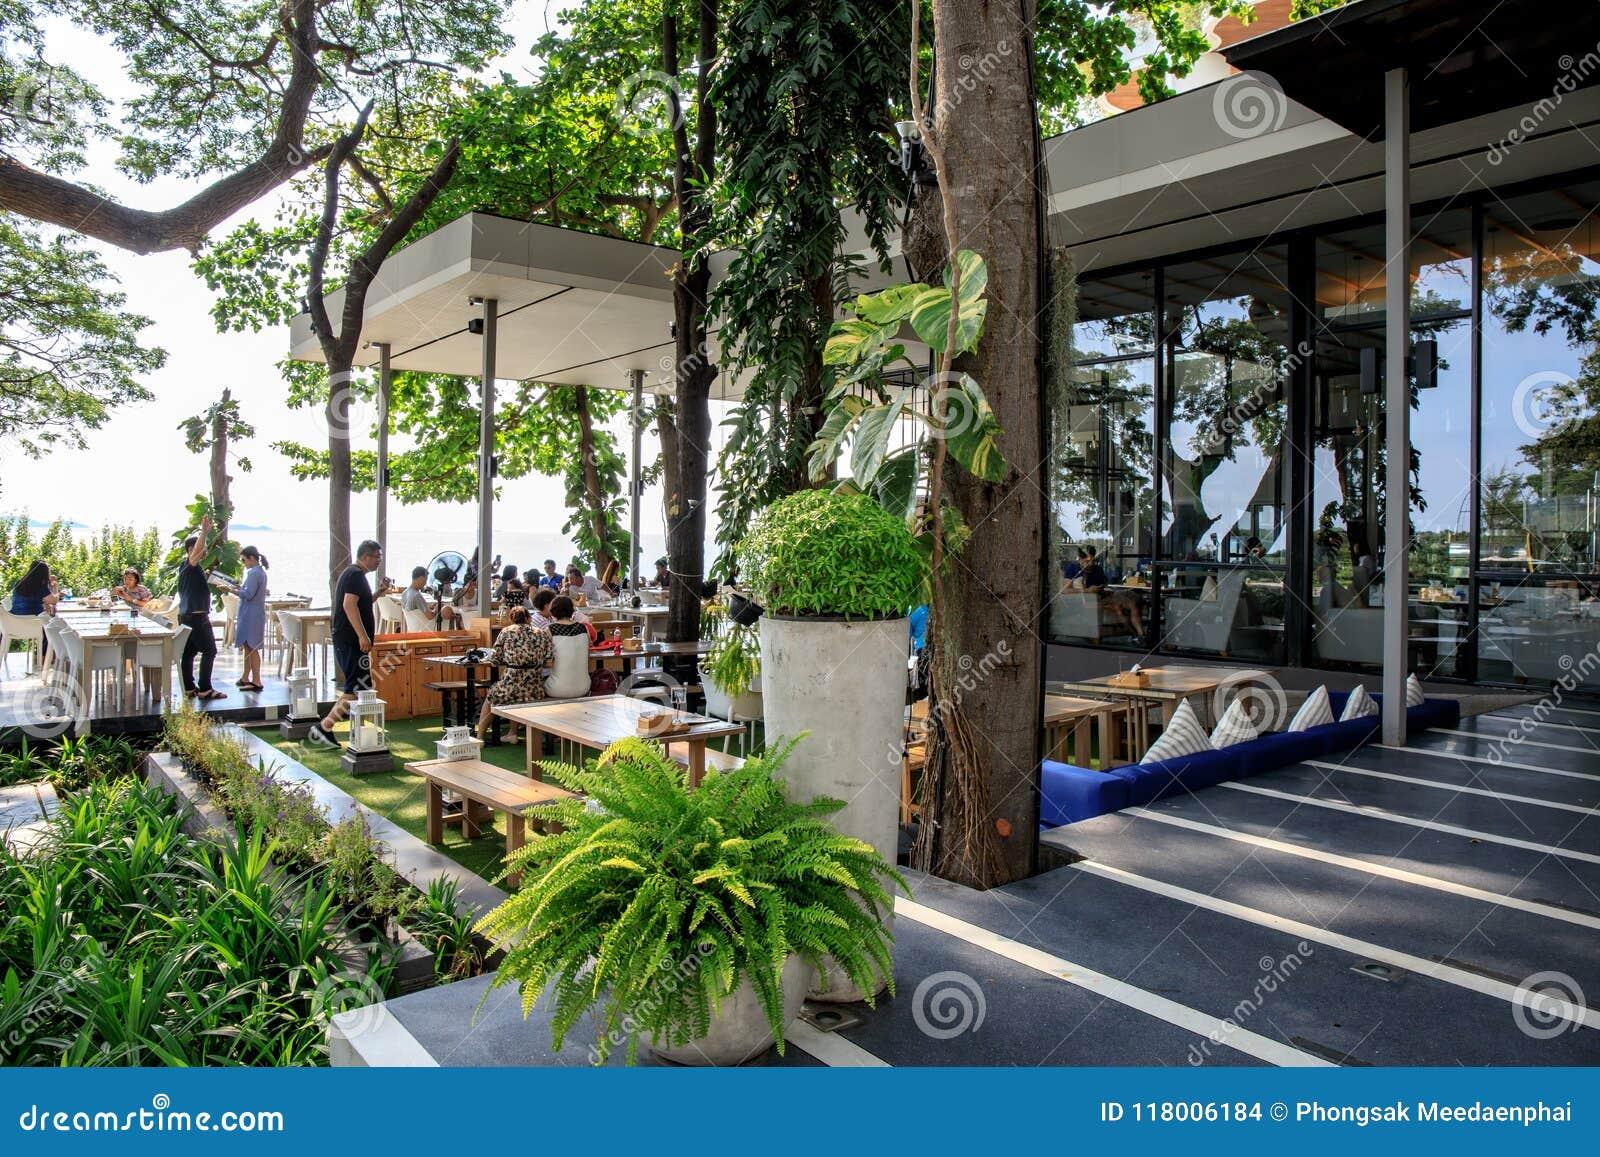 La Terraza Del Del Nombre Del Restaurante O De La